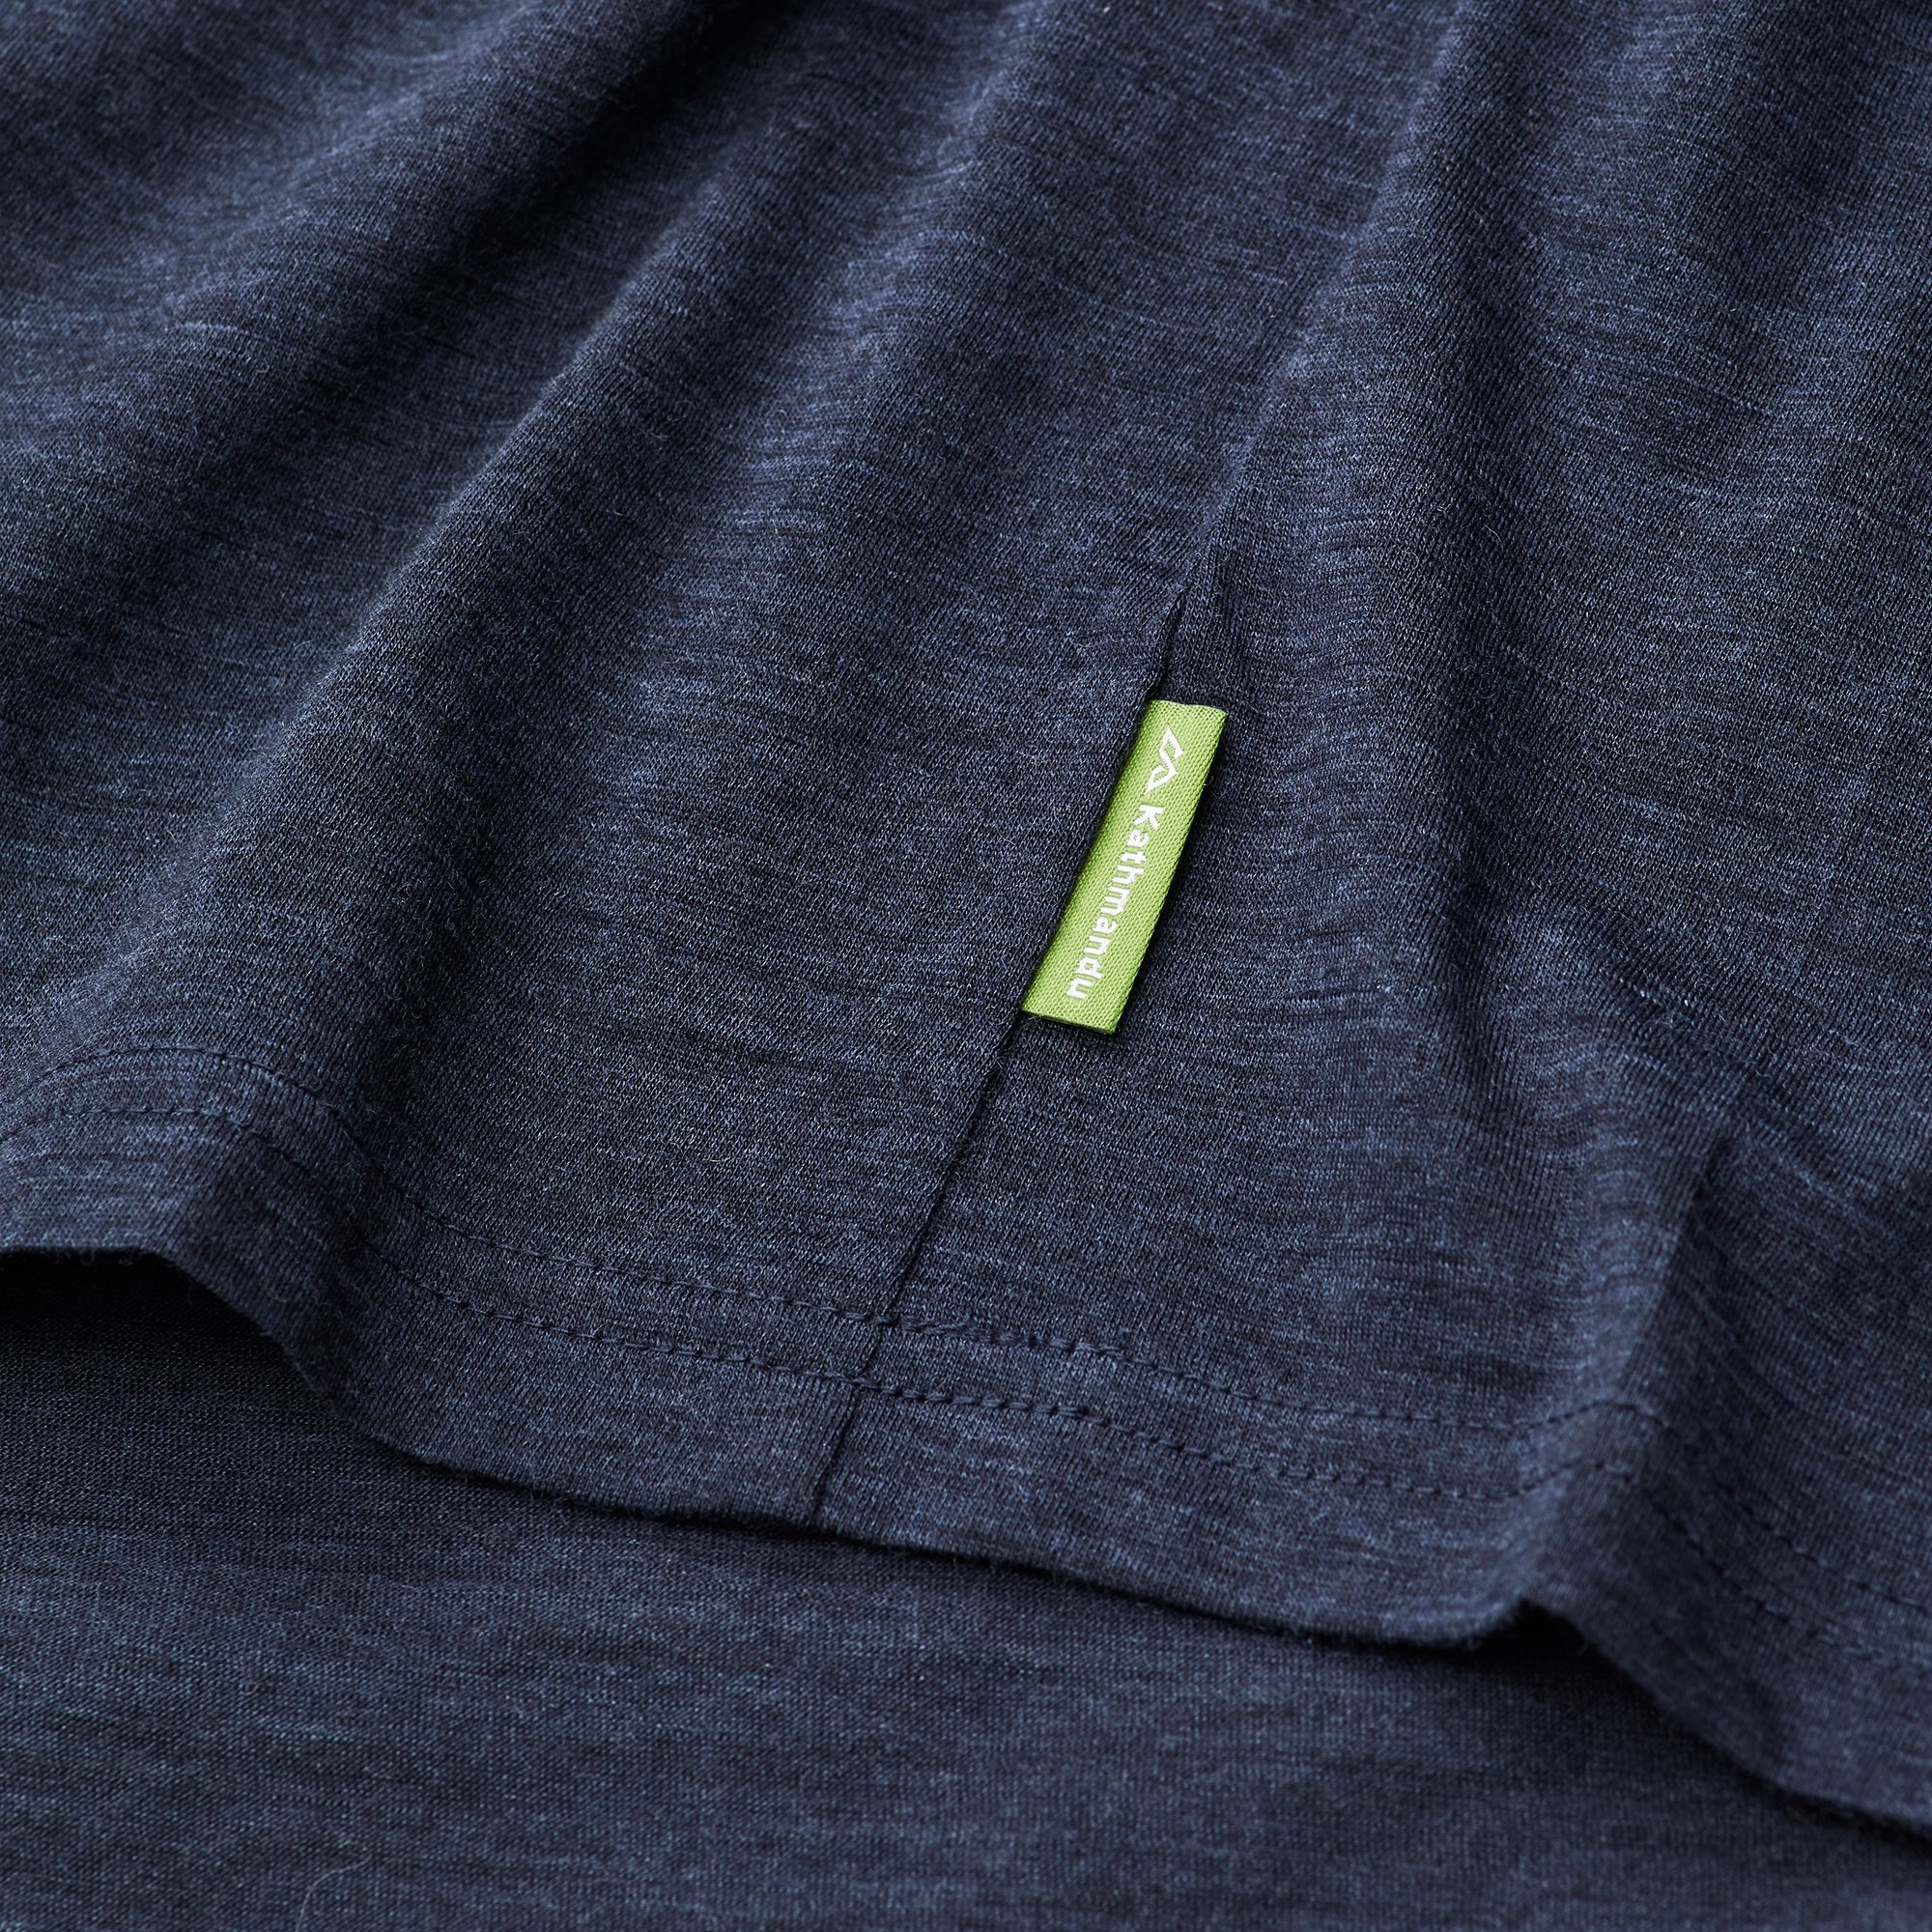 thumbnail 14 - NEW Kathmandu Core Spun Merino Wool Blend Short Sleeve Durable Men's Crew Top